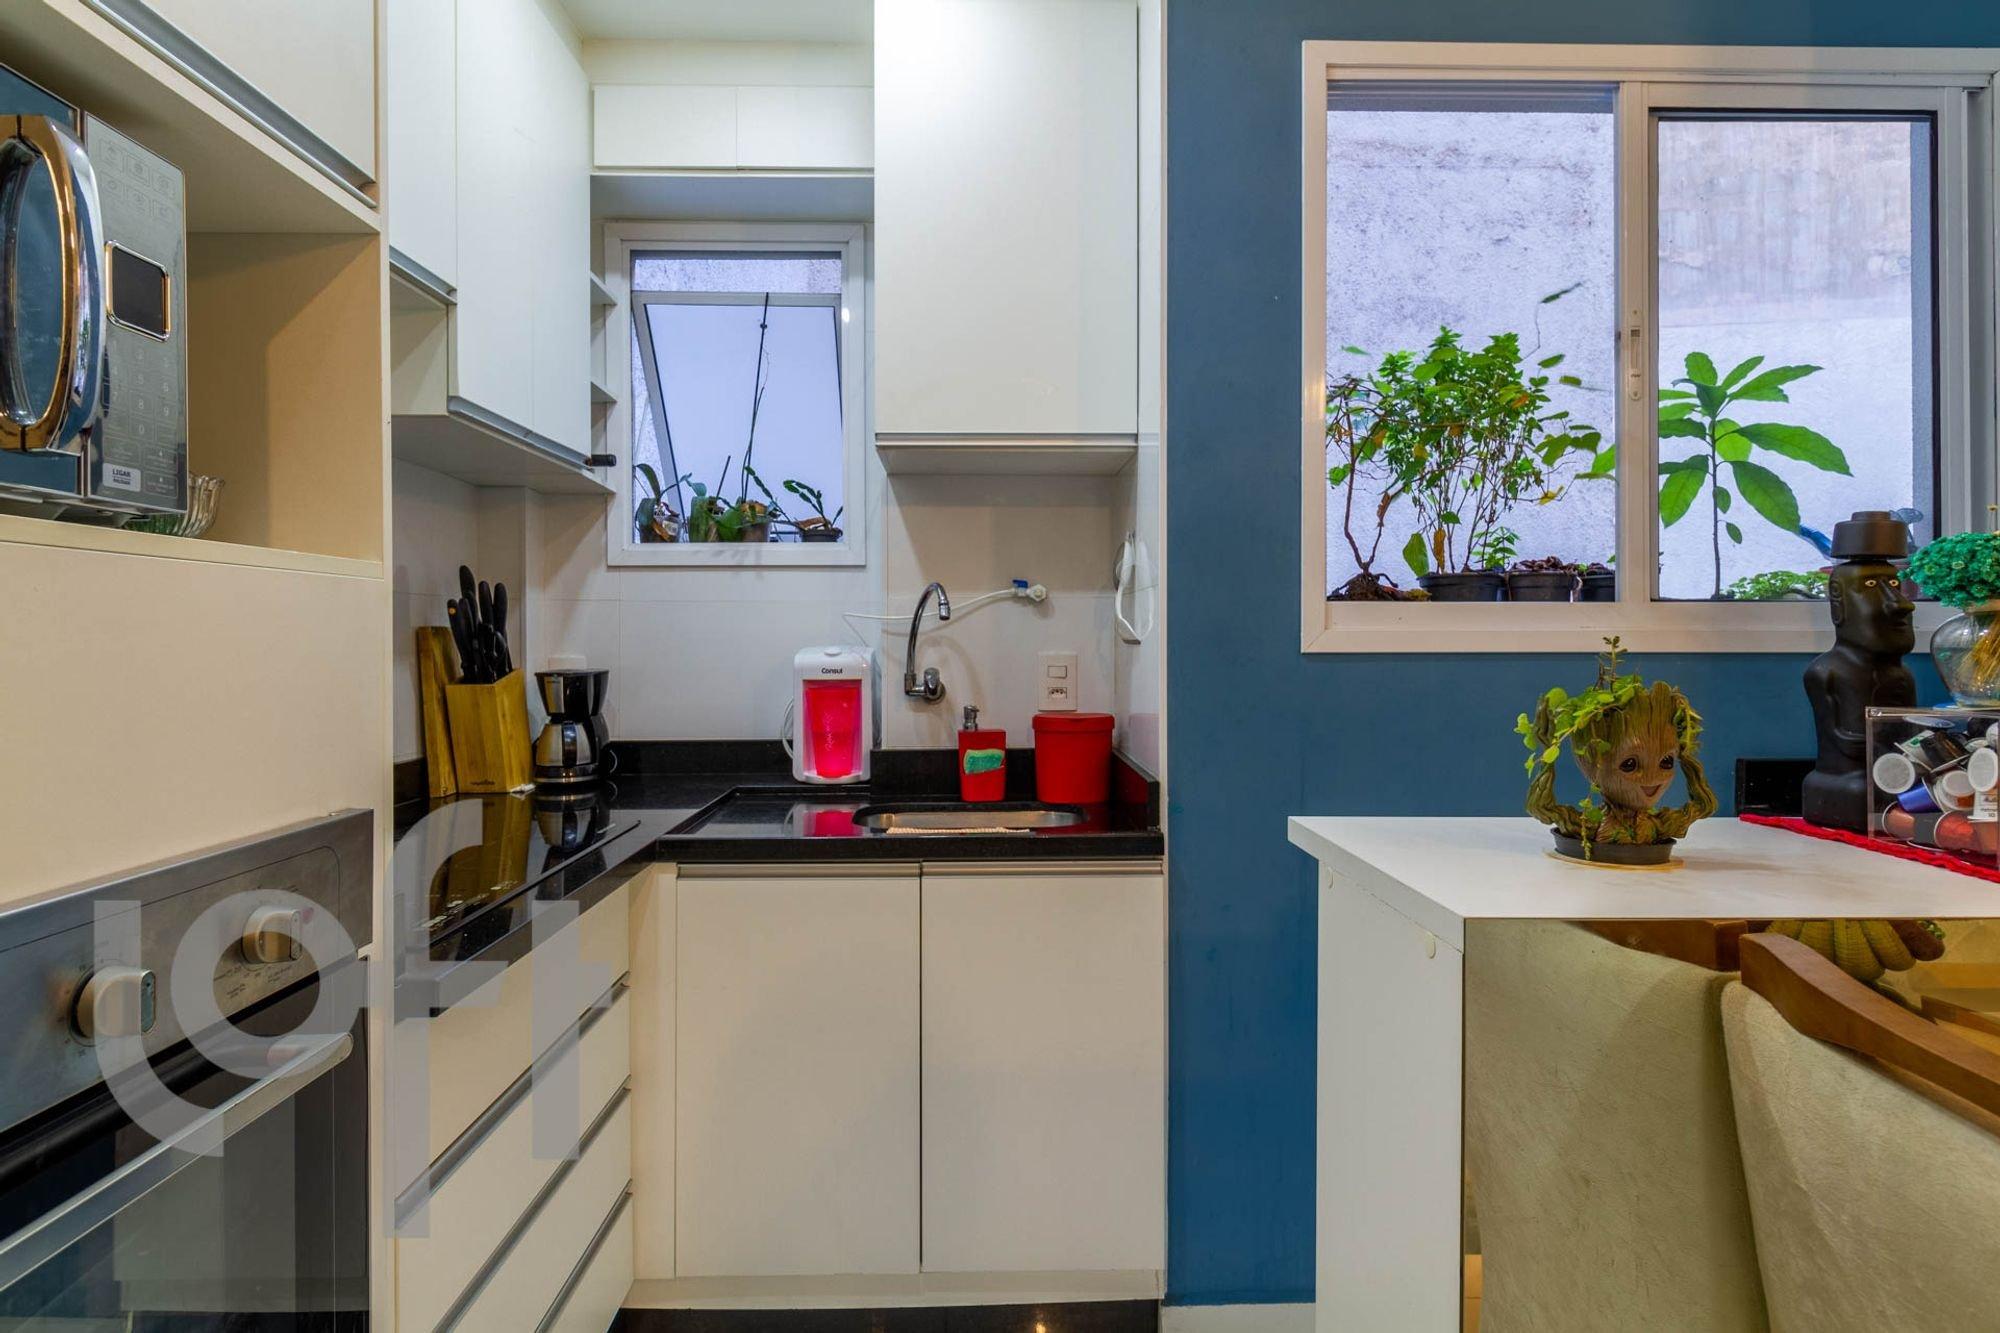 Foto de Cozinha com vaso de planta, faca, vaso, garrafa